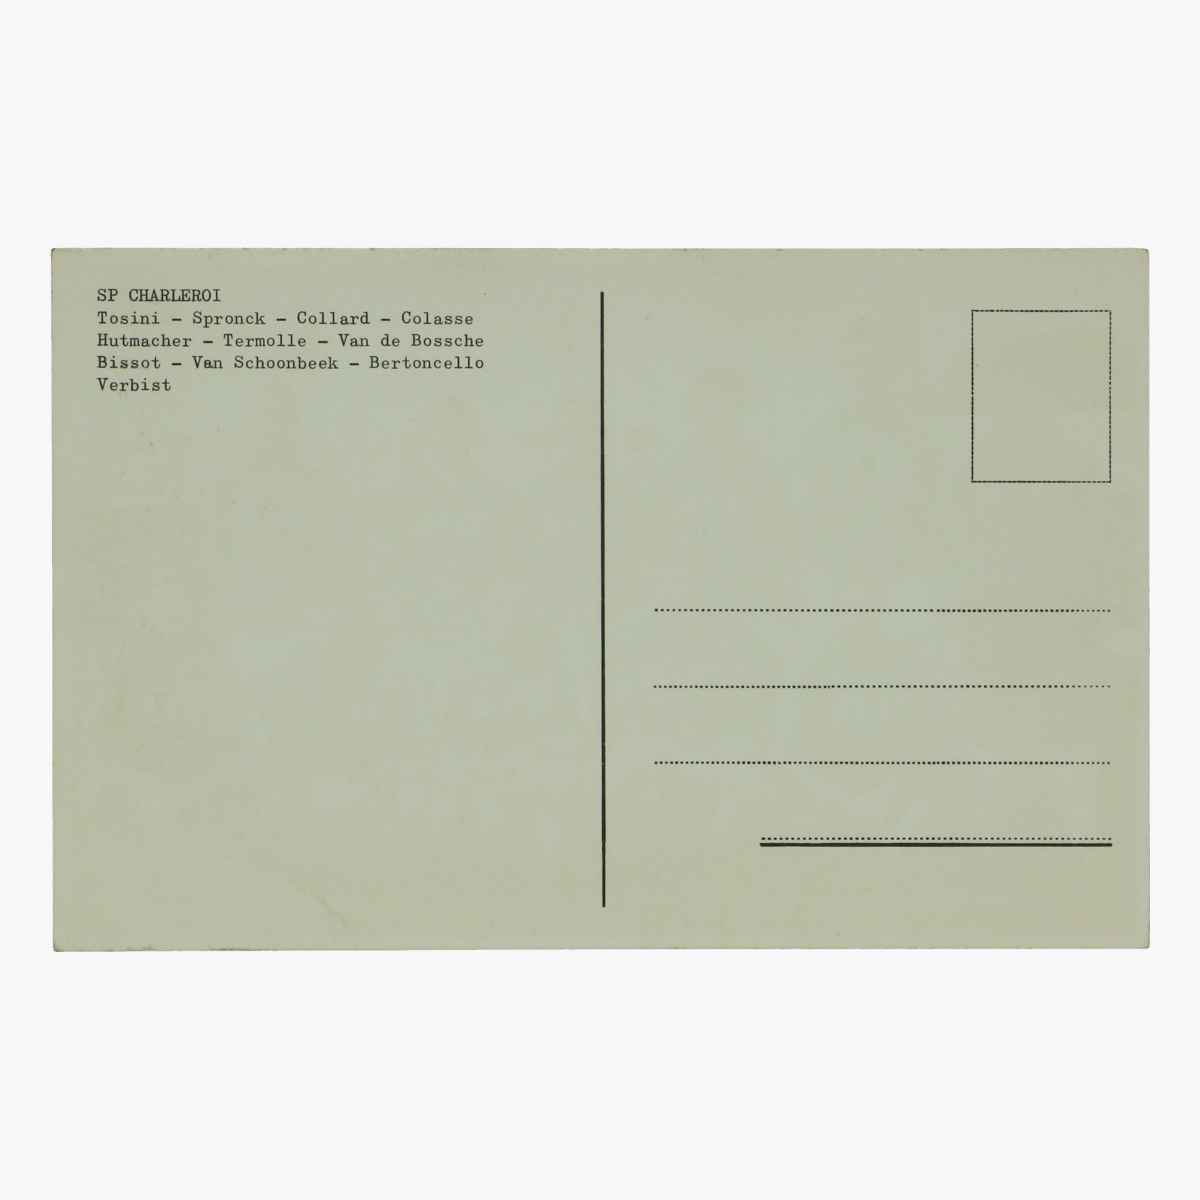 Afbeeldingen van oude postkaart voetbal sp charleroi